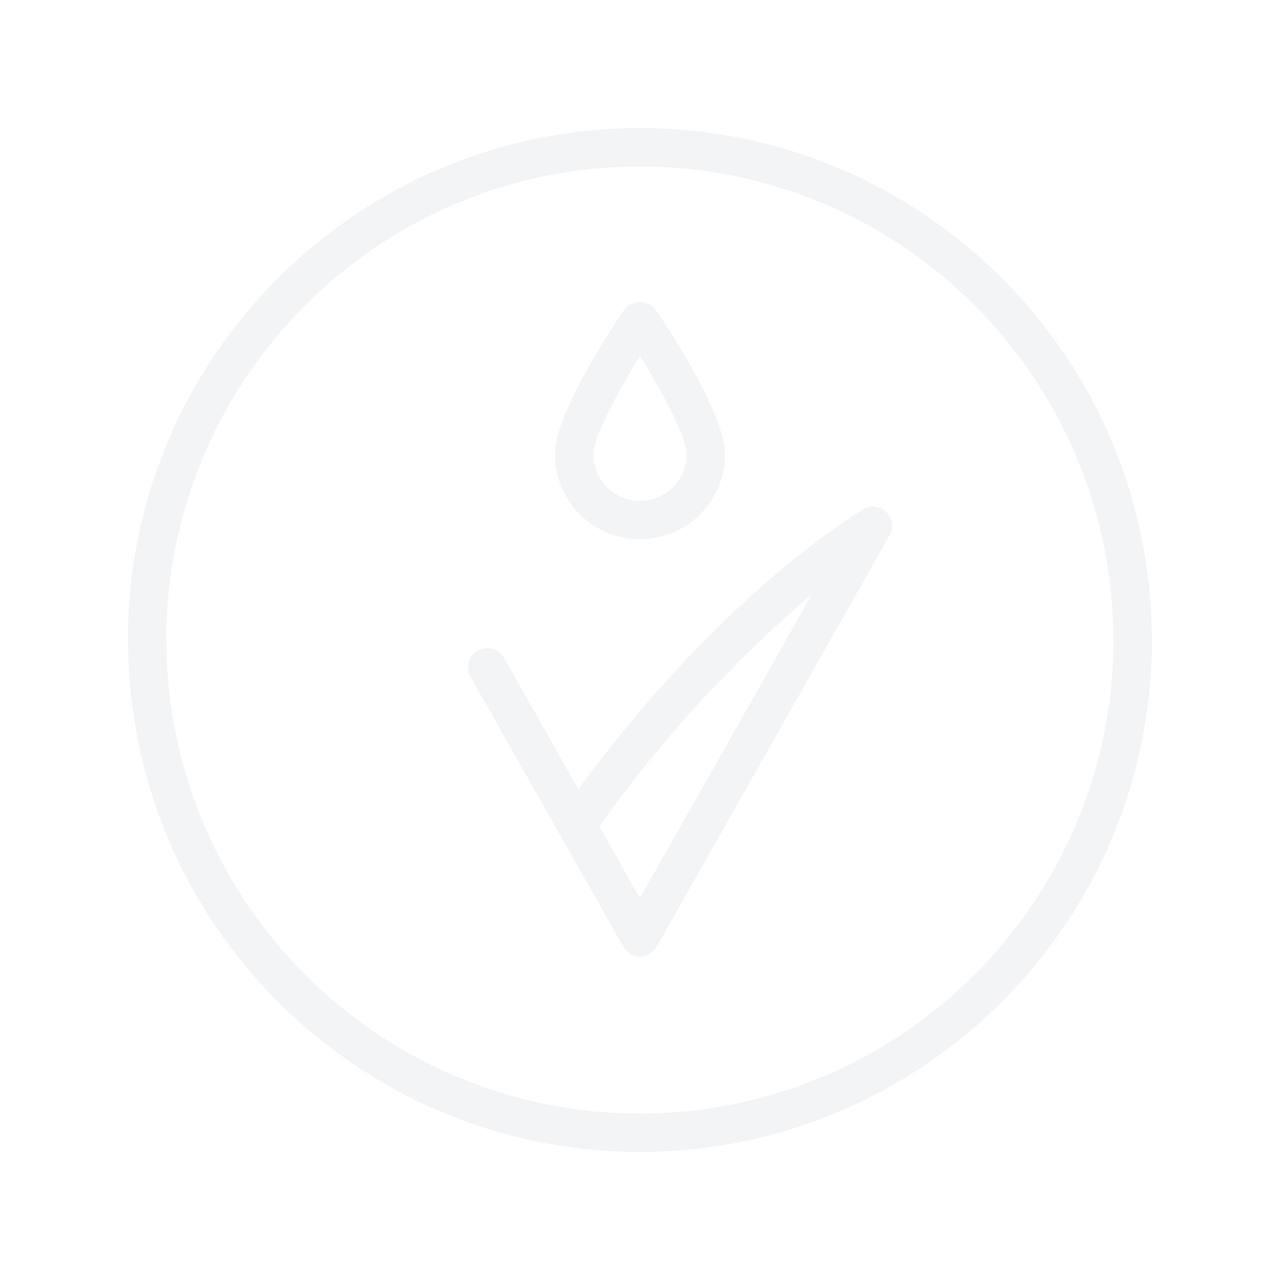 CLINIQUE Cream Shaper For Eyes No.101 Black Diamond 1.2g